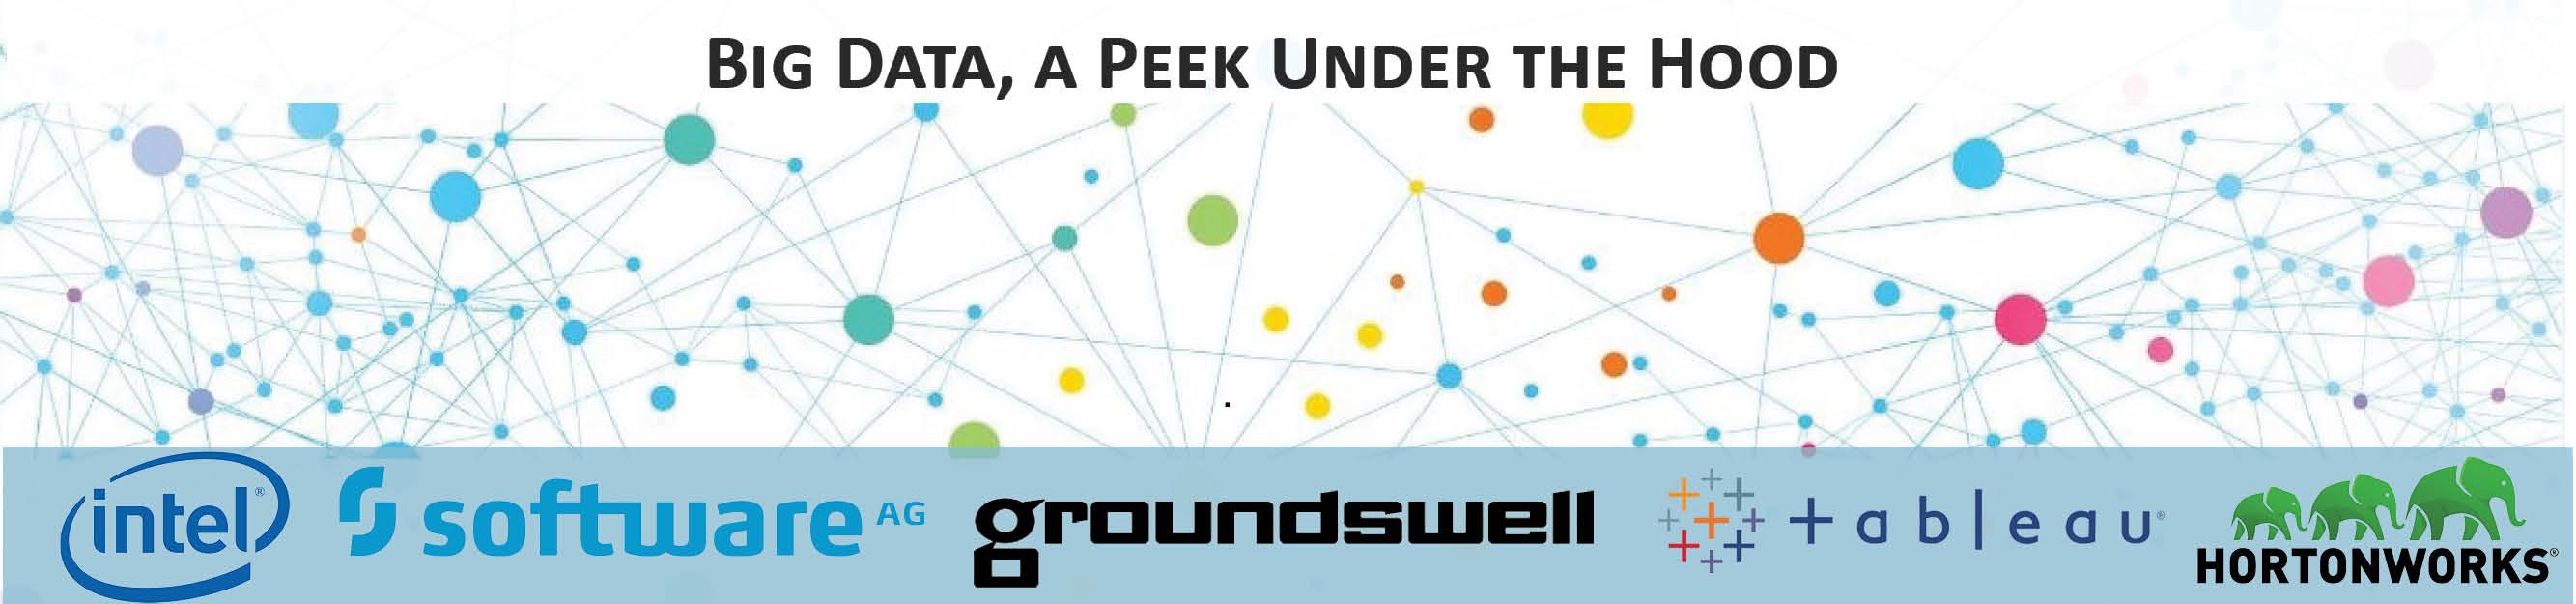 Big Data, a Peek Under the Hood